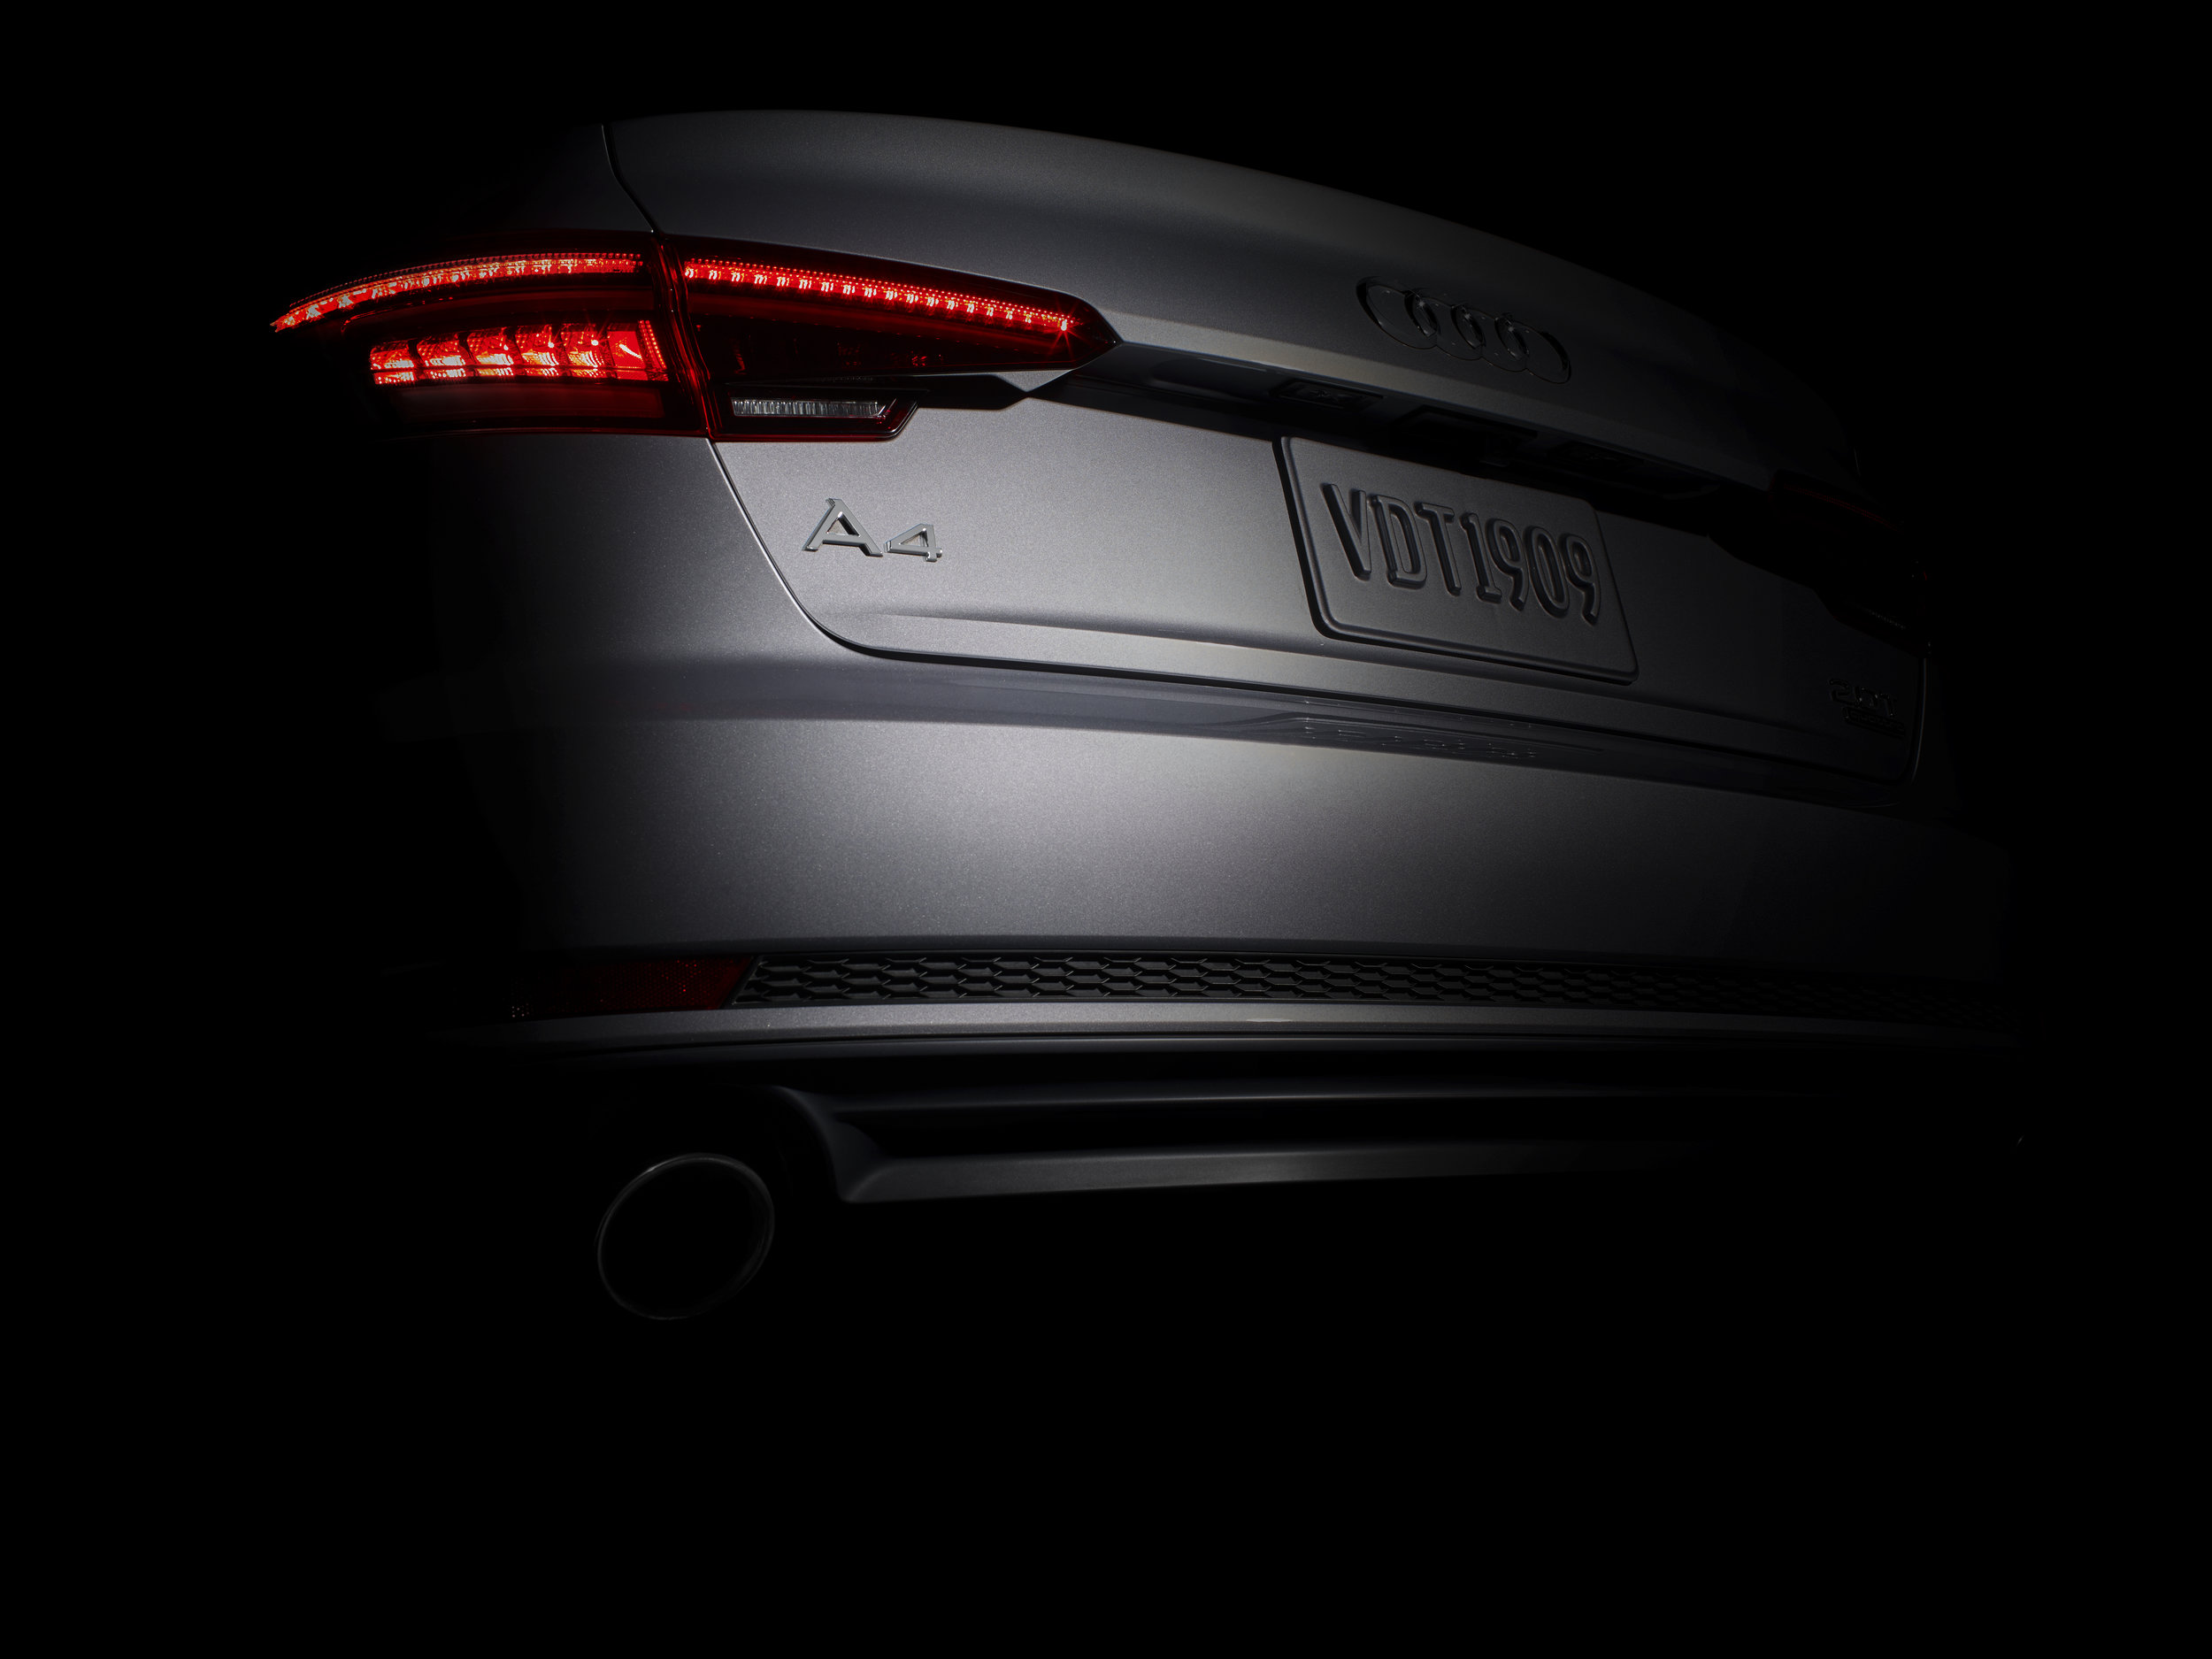 Audi_A4_In_The_Spotlight_D2_03.jpg